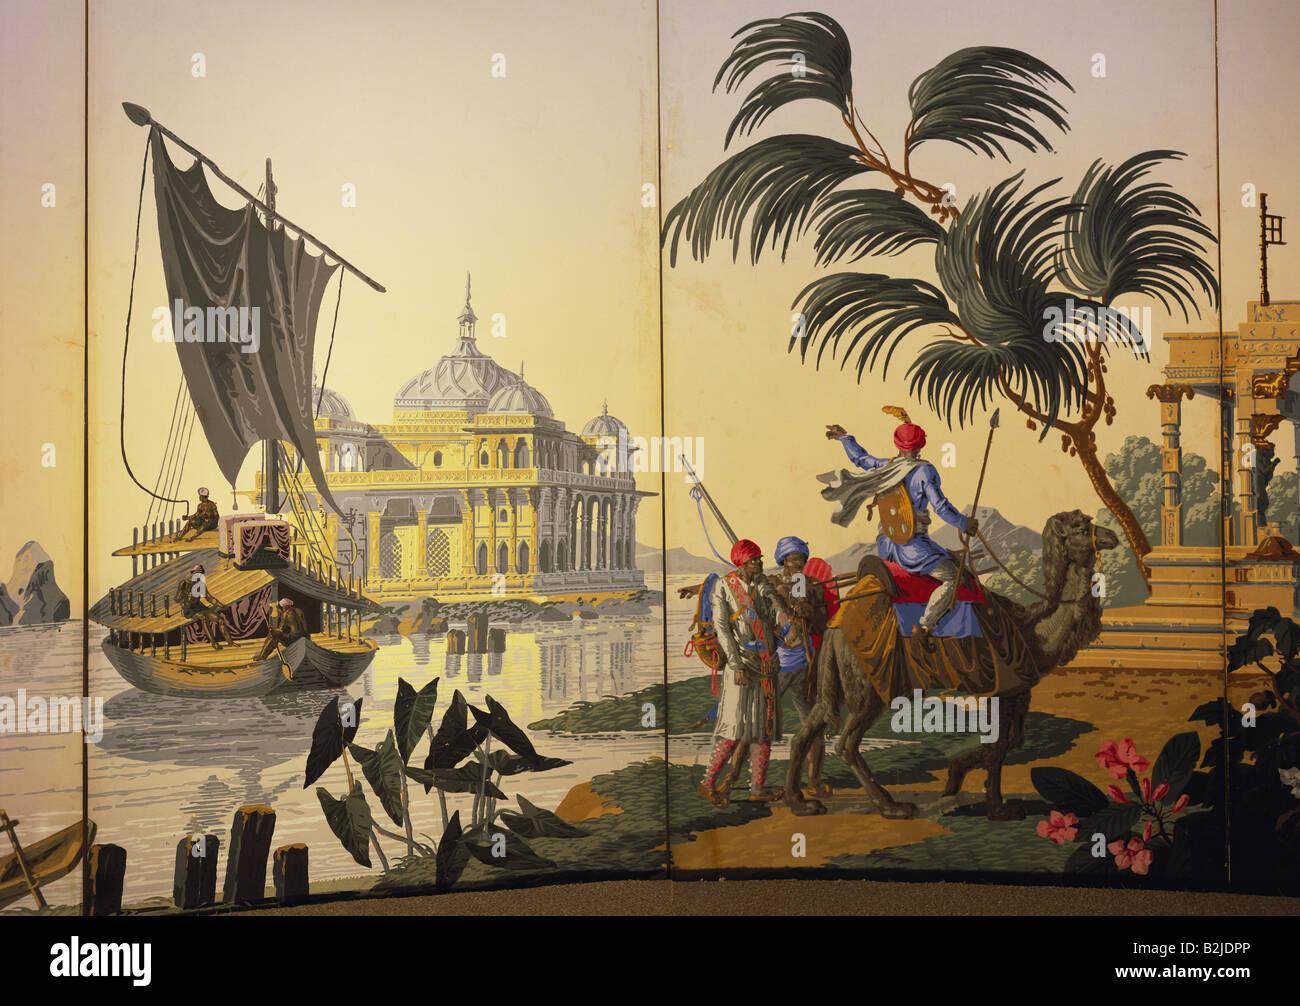 Geographie Voyages L Inde D Amritsar Temple D Or Vue